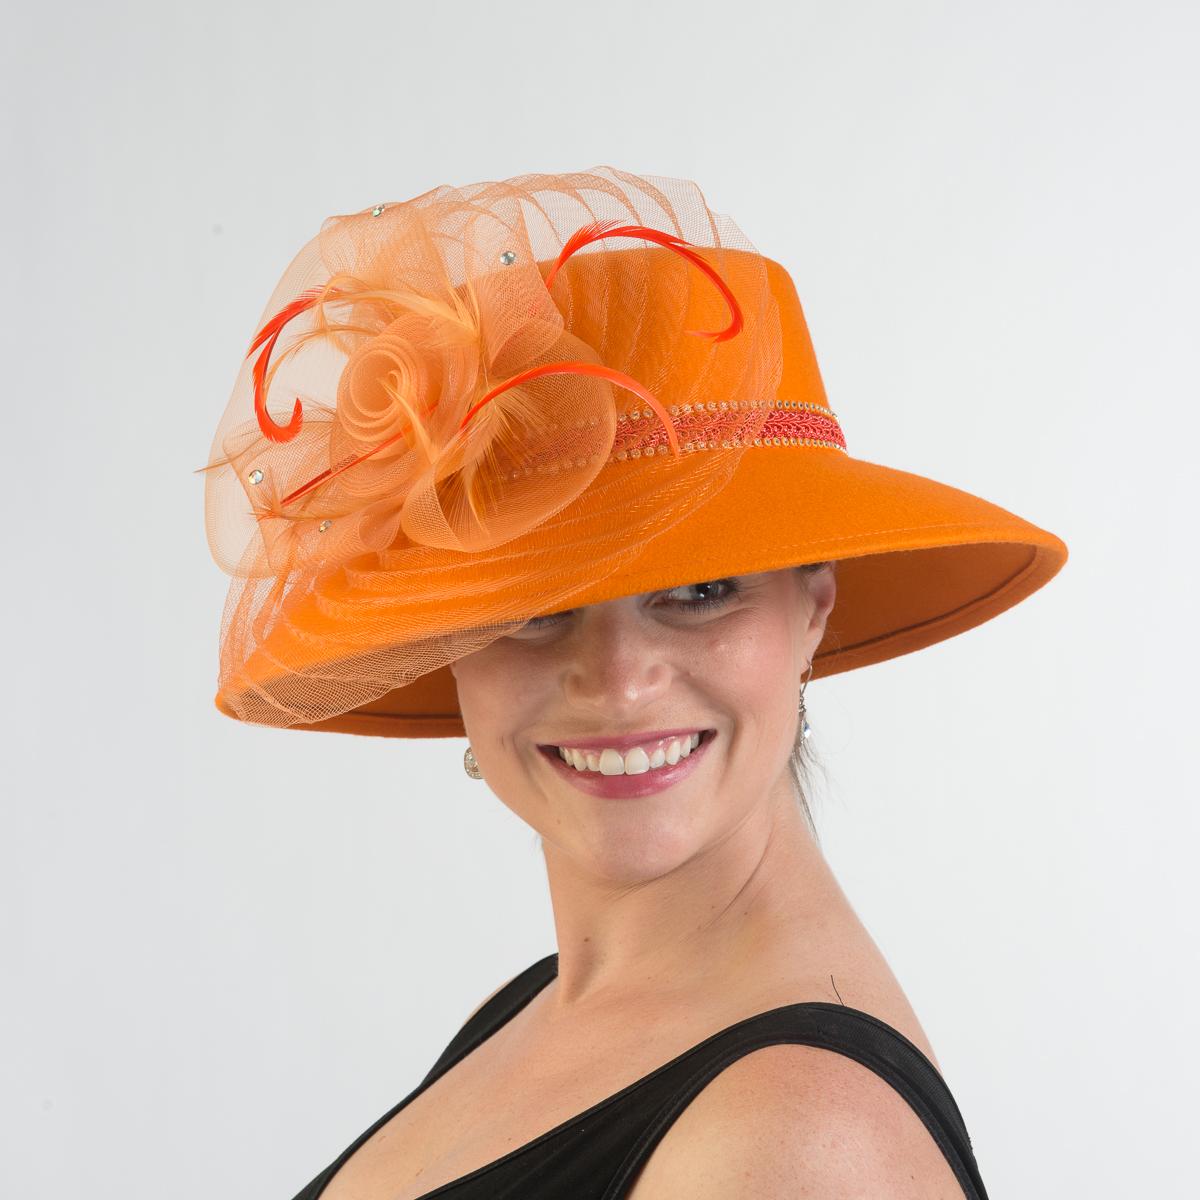 Orange Lampshade Hat Crinoline Feather Hats 400612 Or Sun